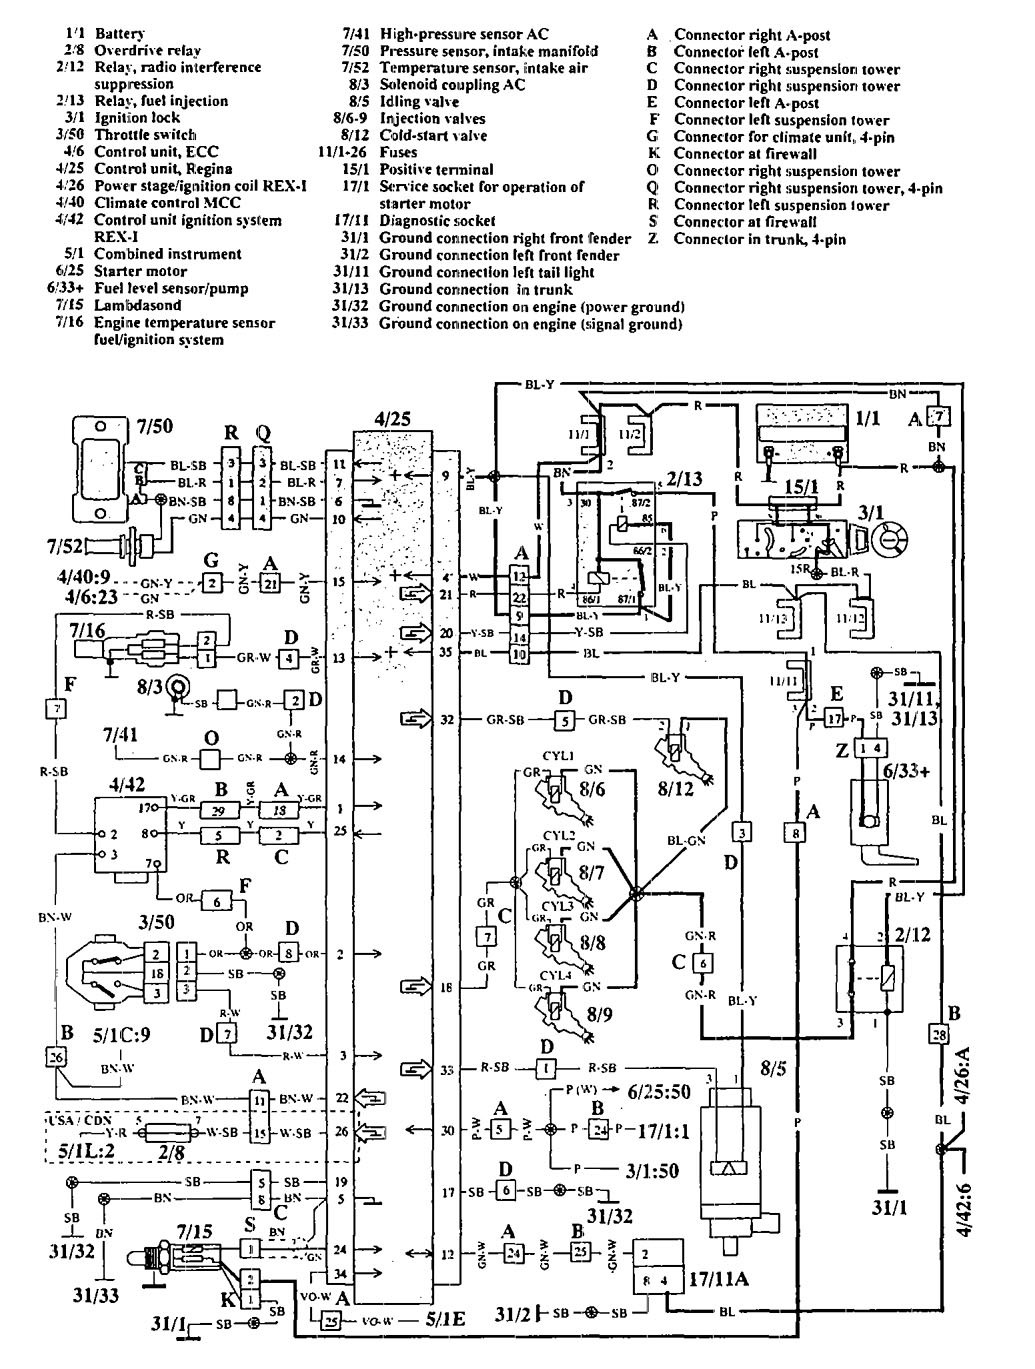 1992 940 gl wiring diagram manual e bookWiring Diagram Also Volvo 960 Wiring Diagram 1992 Moreover Alternator #13